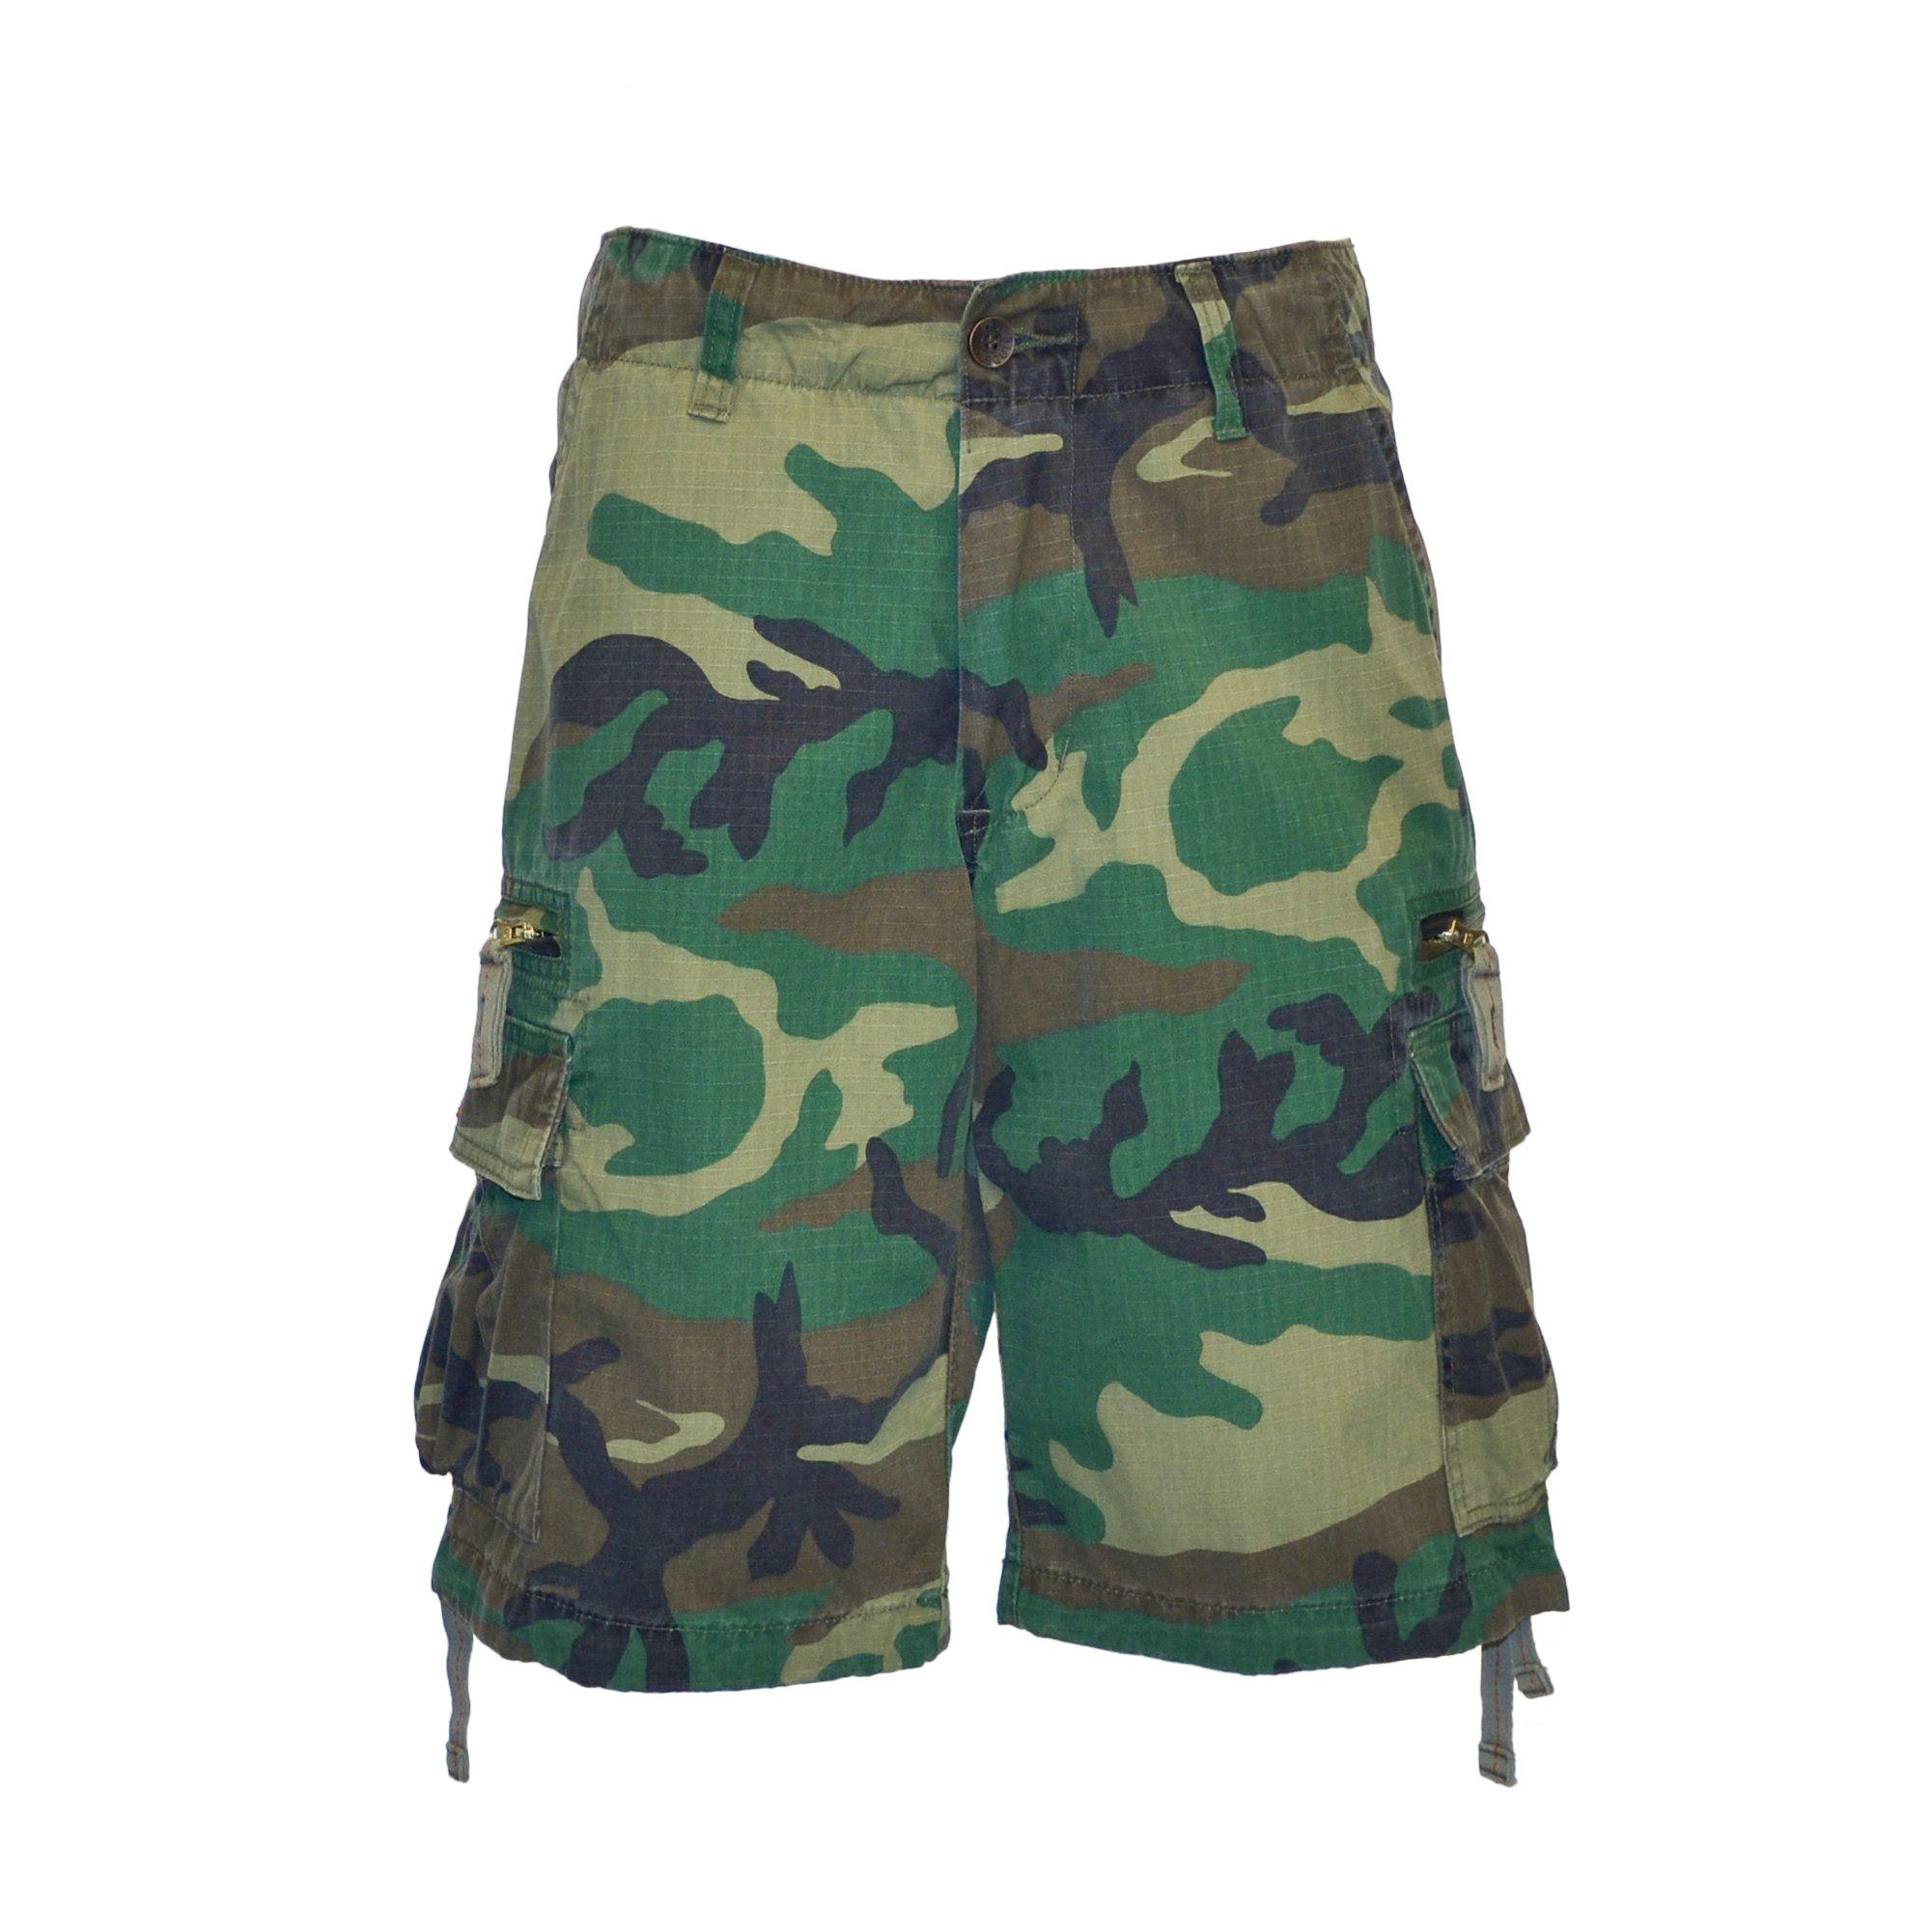 Molecule Men's Zipped Railers Cargo Shorts - Lightweight Cotton, Zipped Pockets   USA 31''/S (Tag M) Euro Woodland Camo